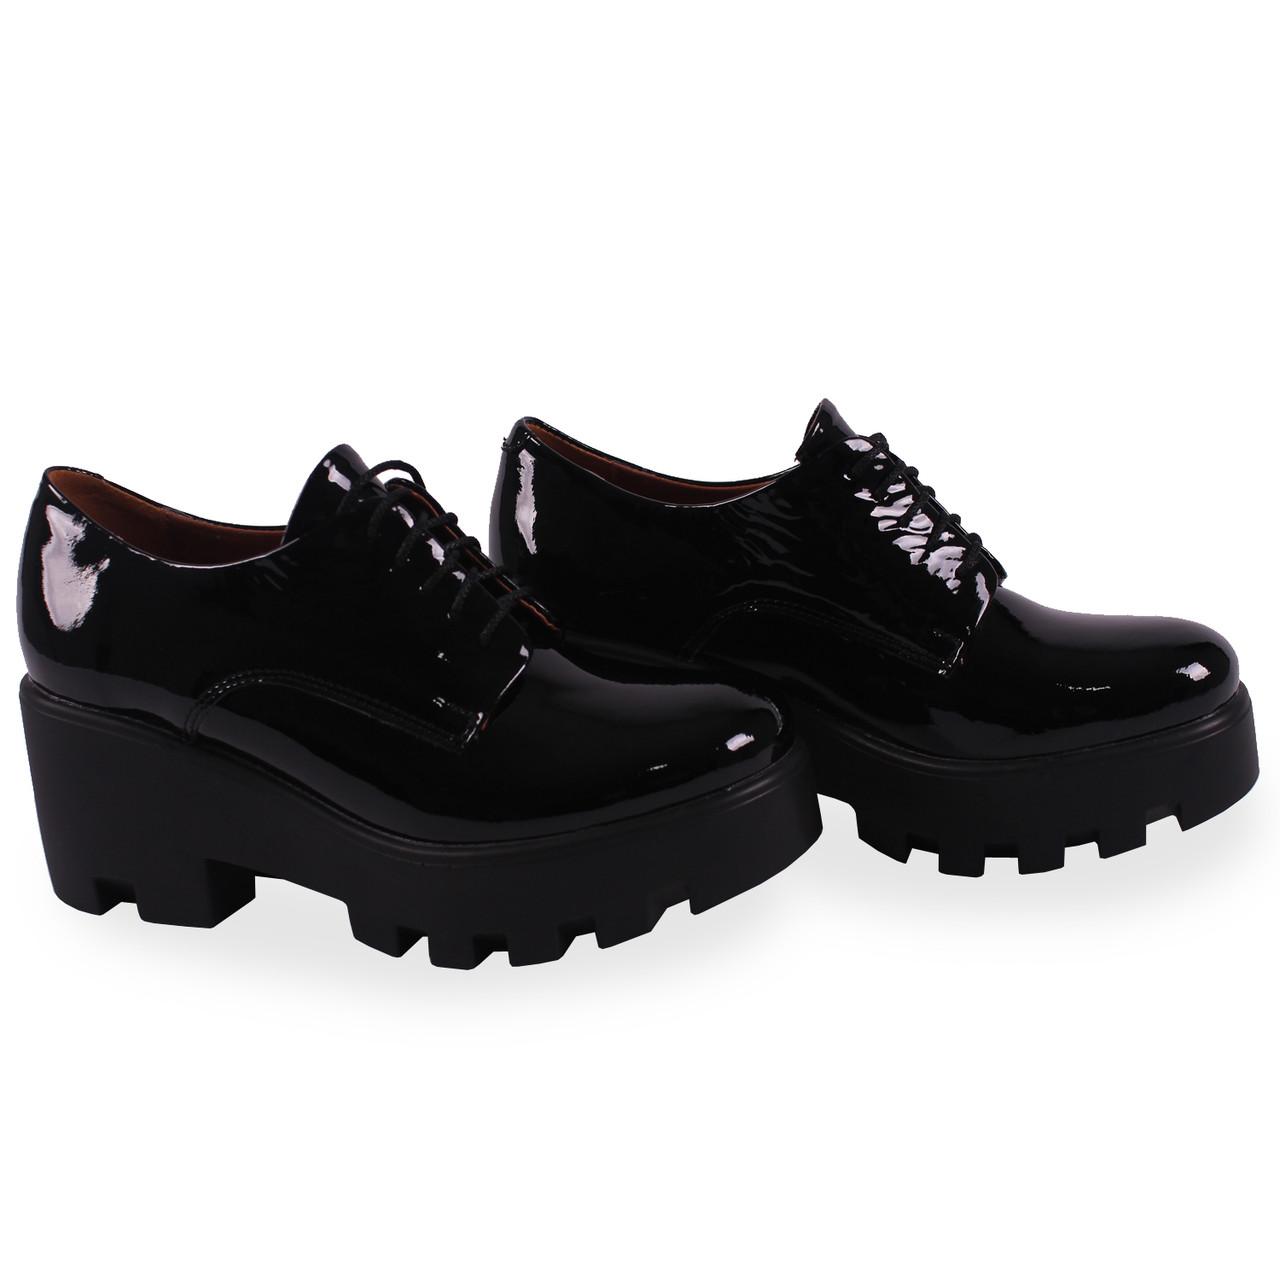 женские туфли на платформе фото